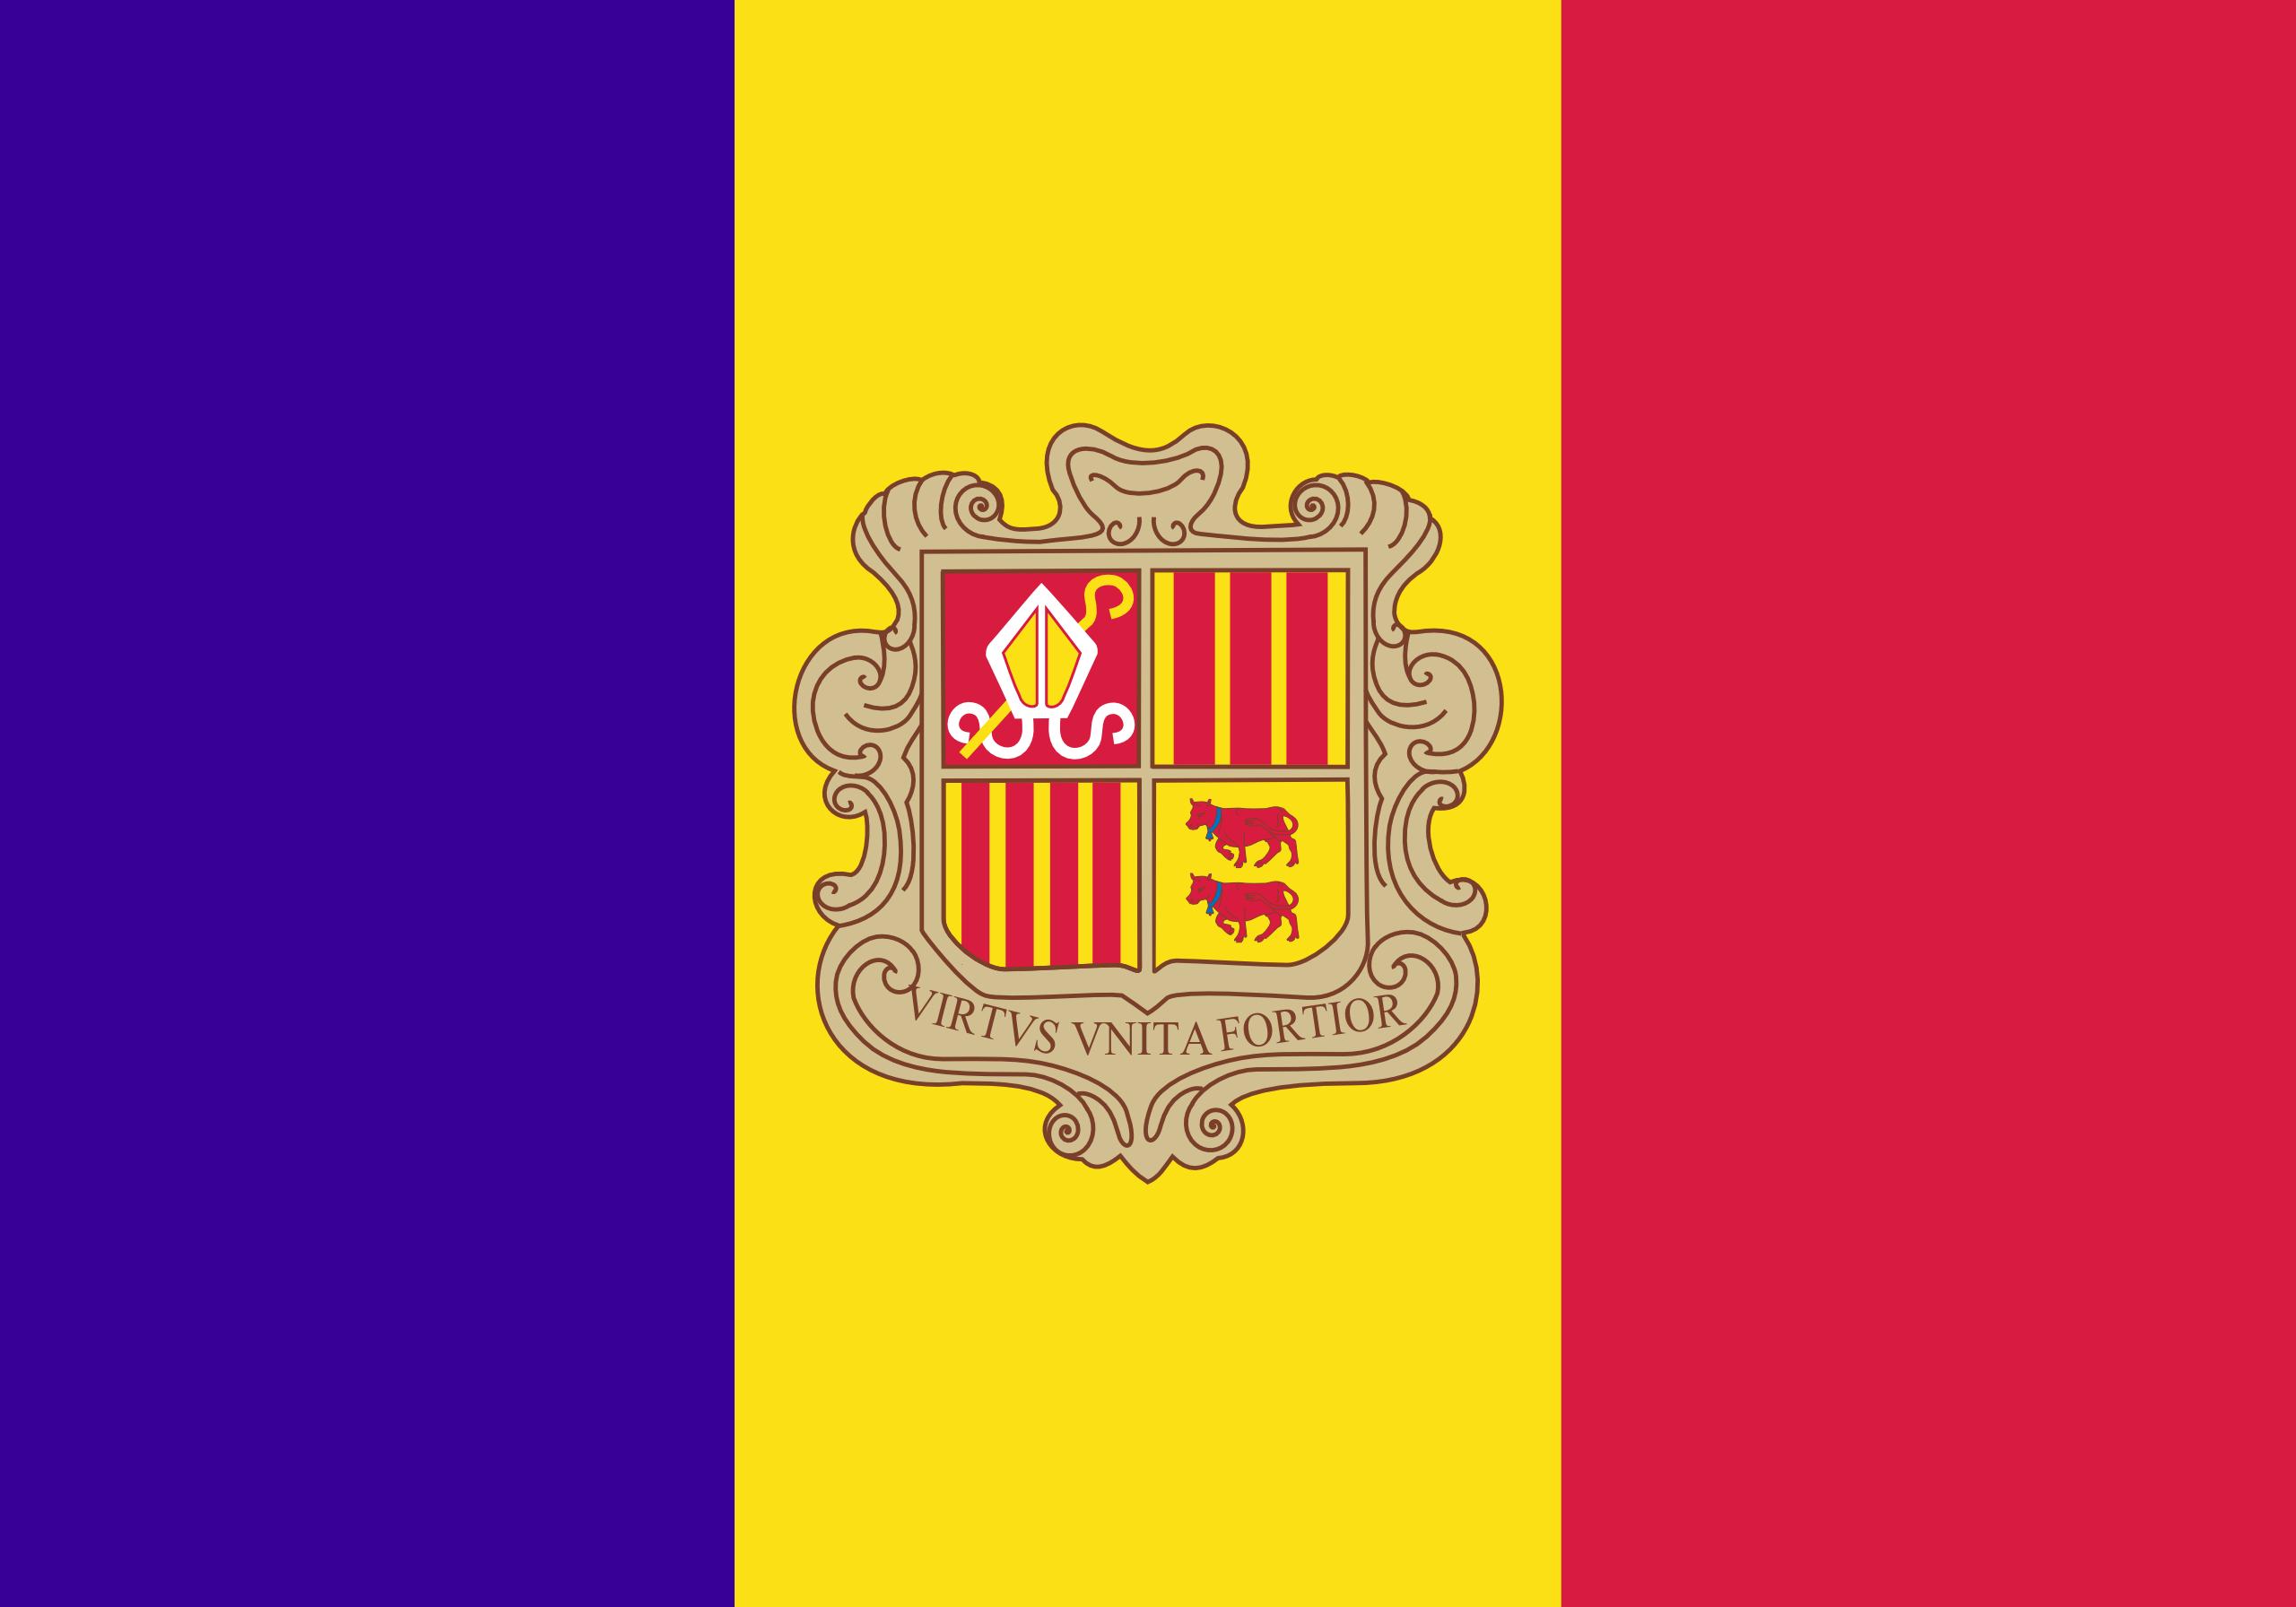 andorra, страна, Эмблема, логотип, символ - Обои HD - Профессор falken.com